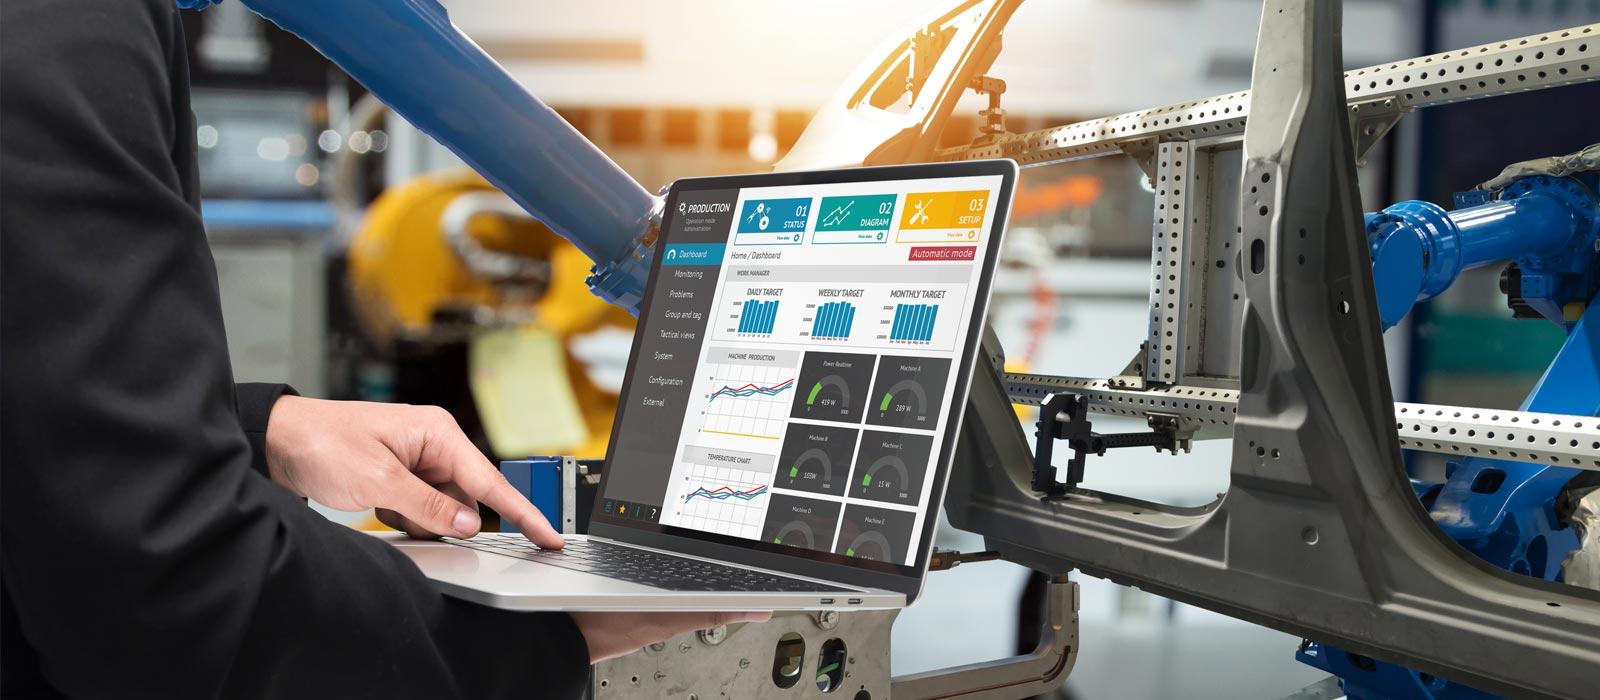 Assembly Line Monitoring Using Advanced AI Technology